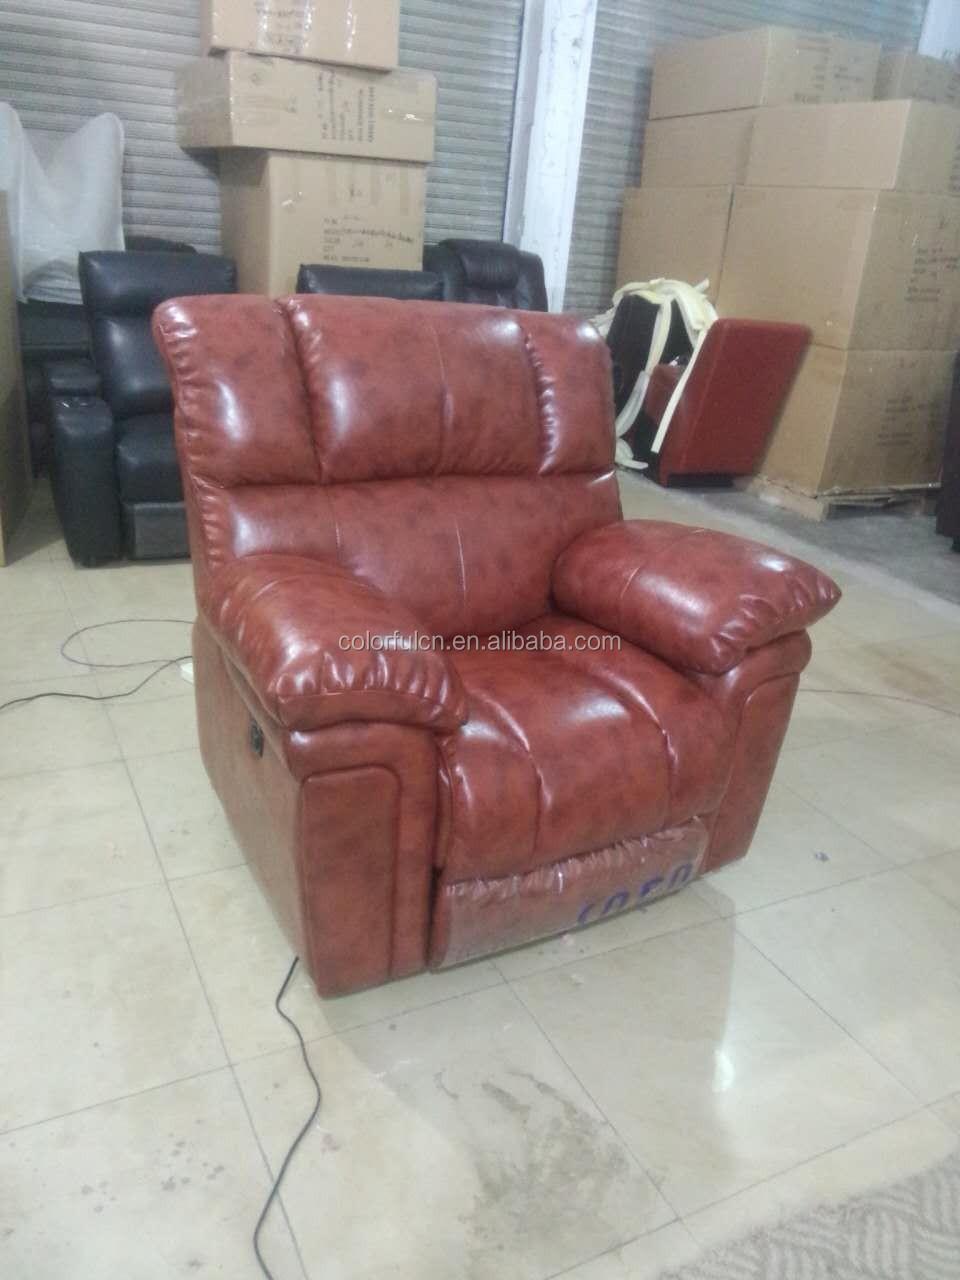 Pellissima 躺椅沙发躺椅按摩沙发 Ls629 Buy Pellissima 躺椅沙发,躺椅按摩沙发,电动躺椅沙发 Product on